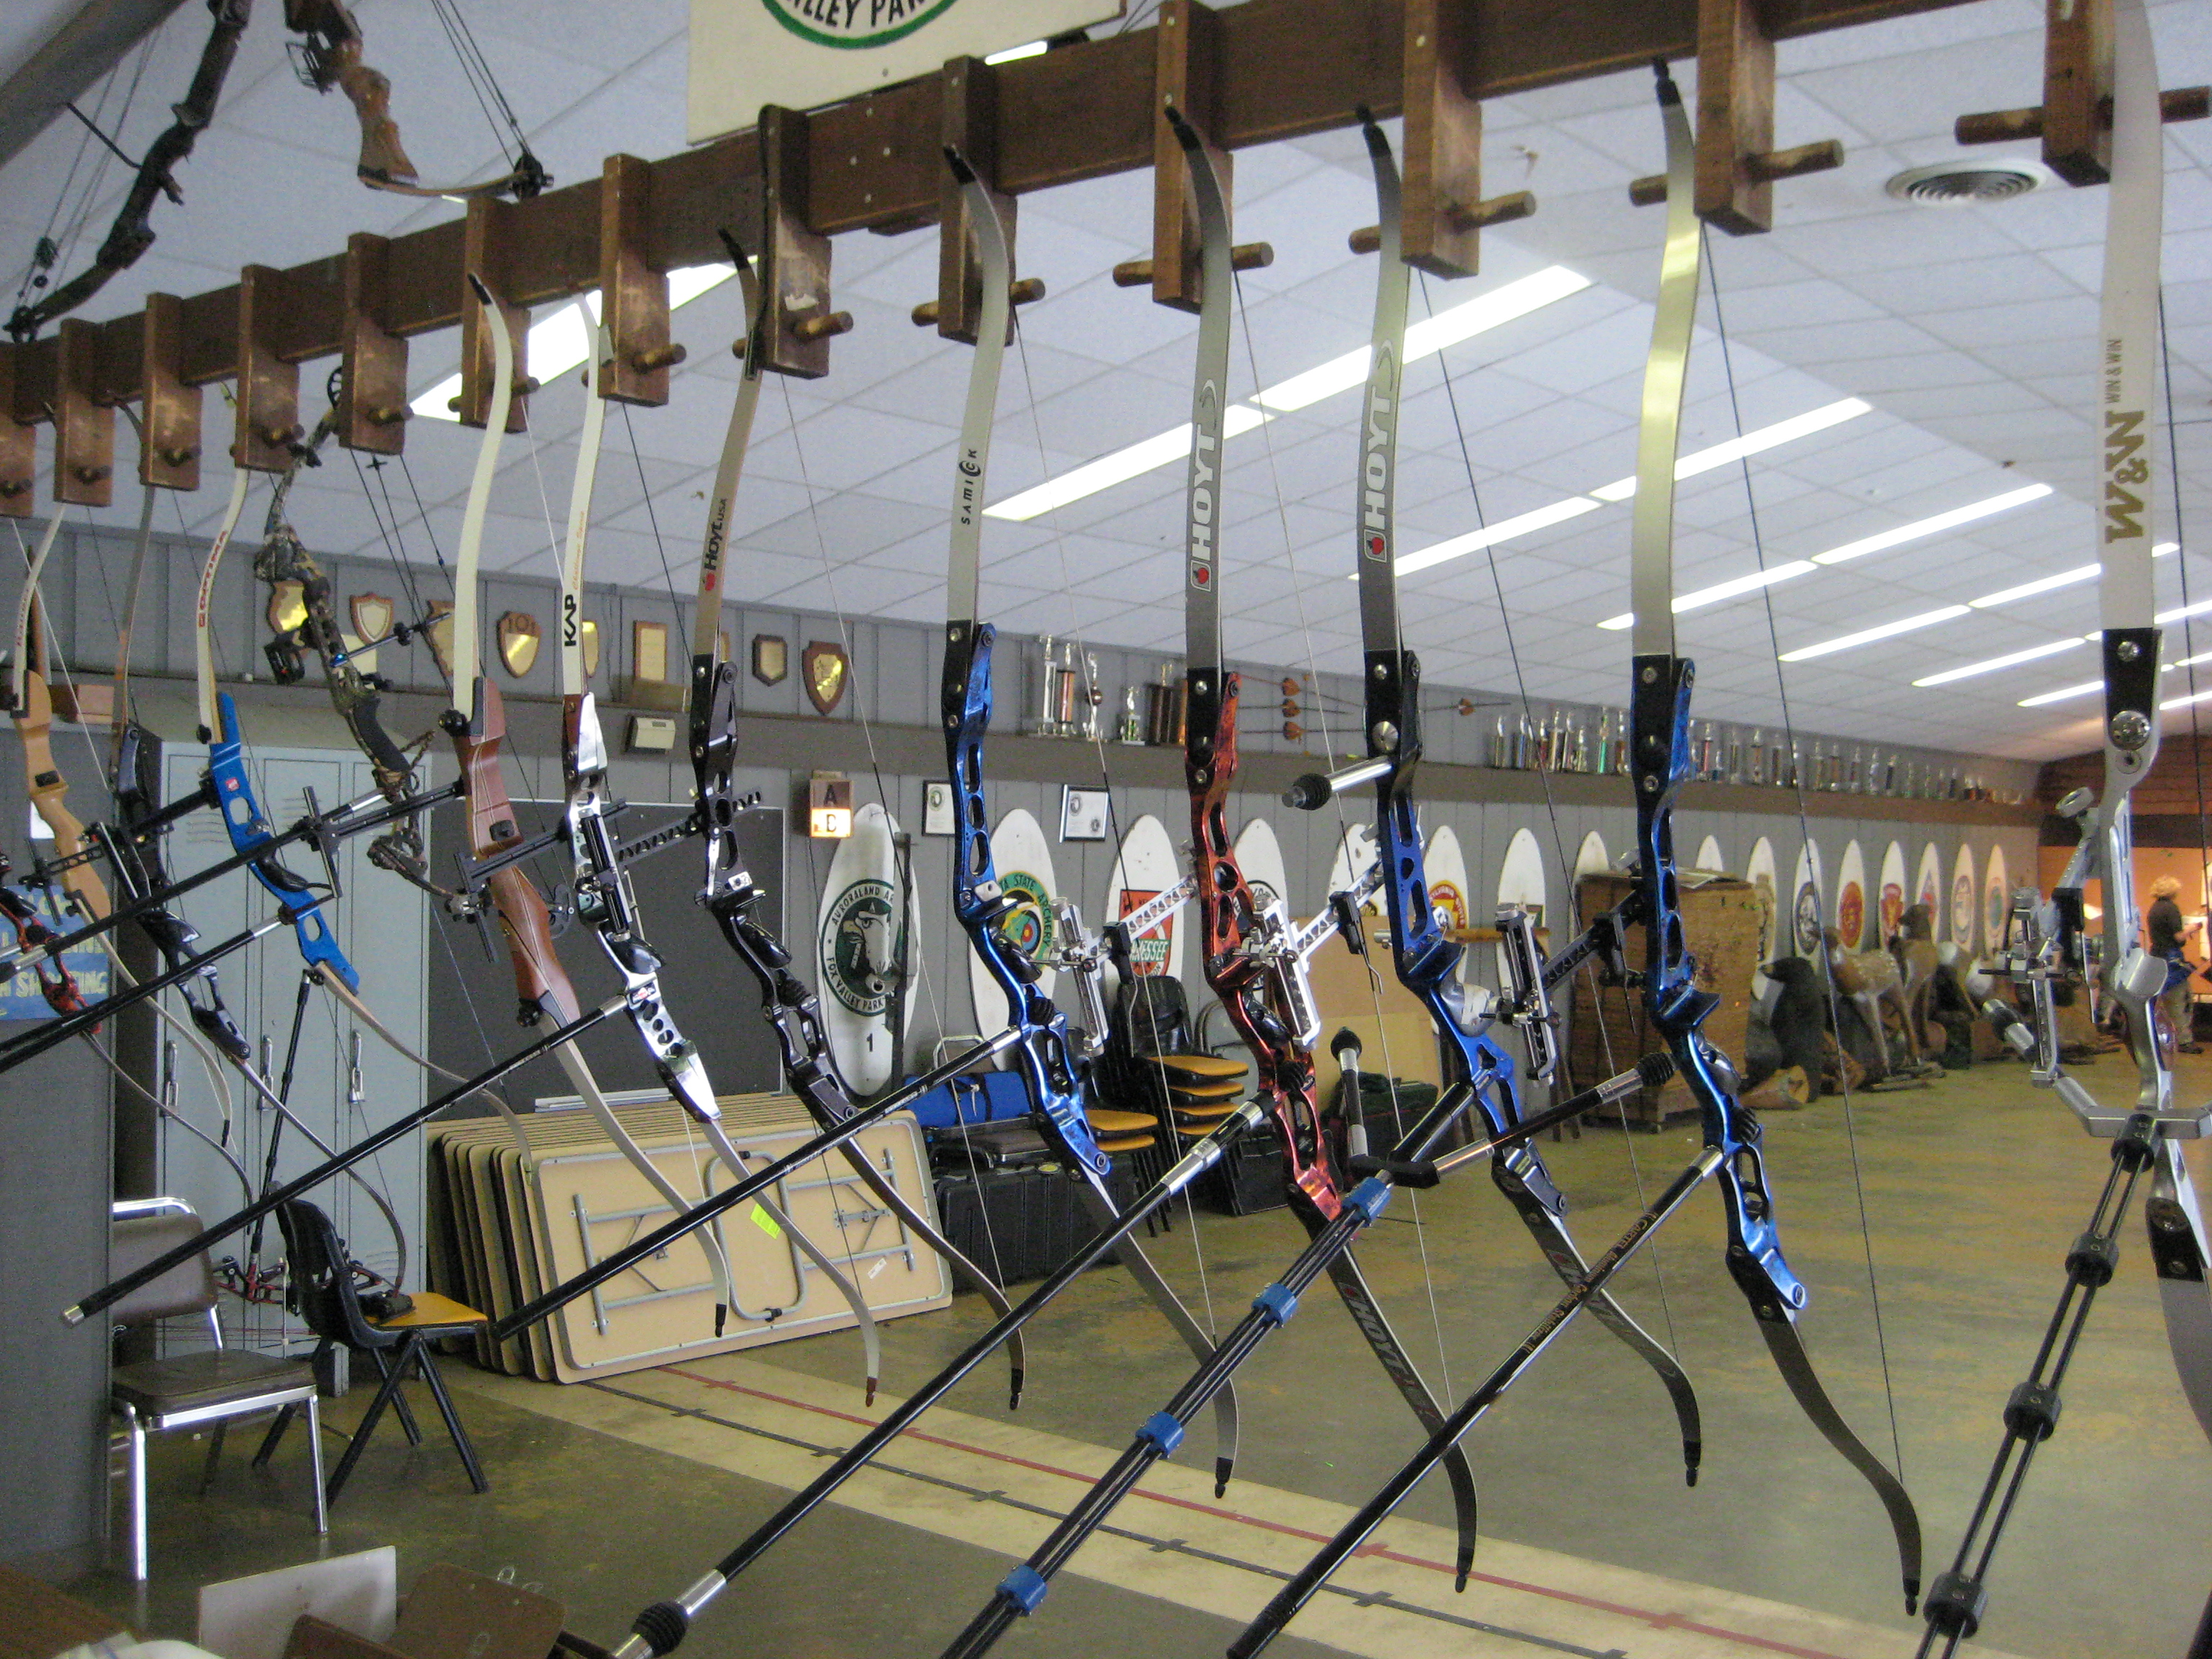 Lippold Park indoor range